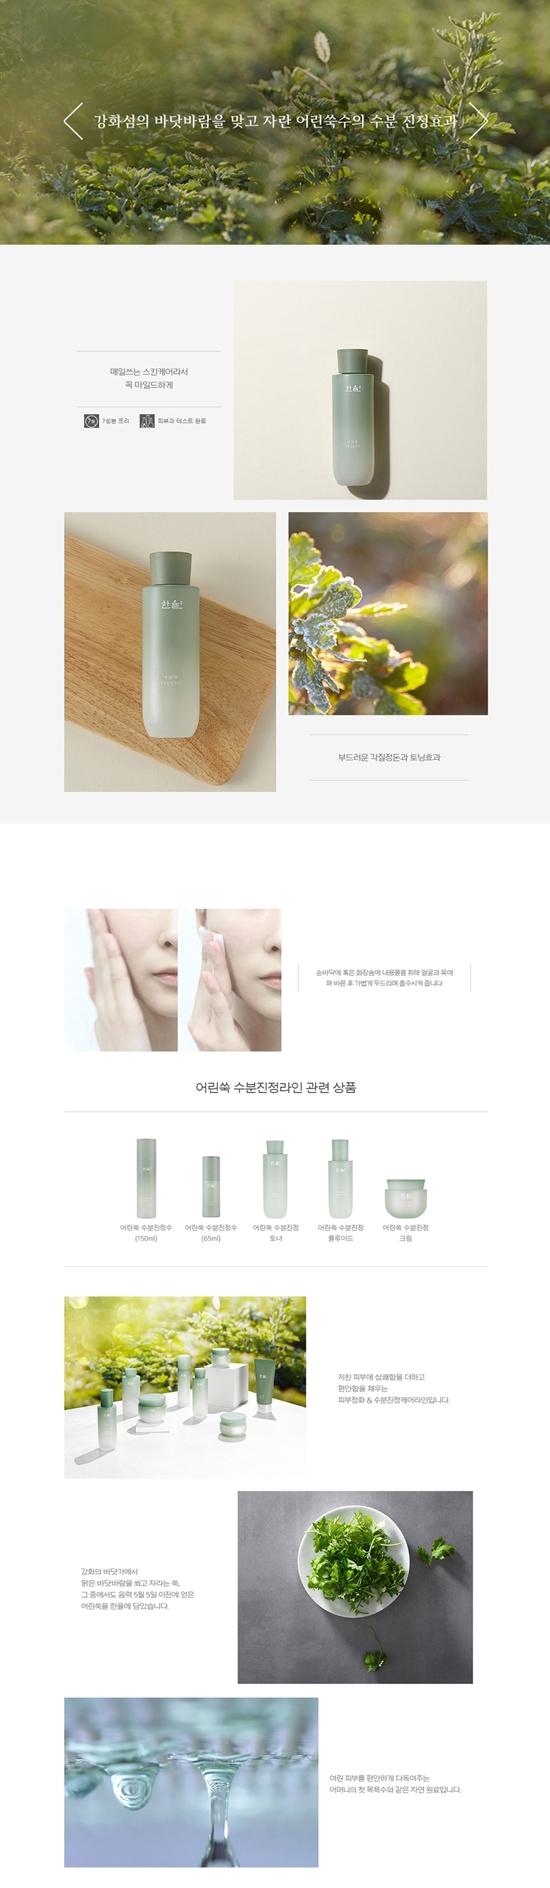 hanyul-pure-artemisia-watery-calming-toner-info.jpg